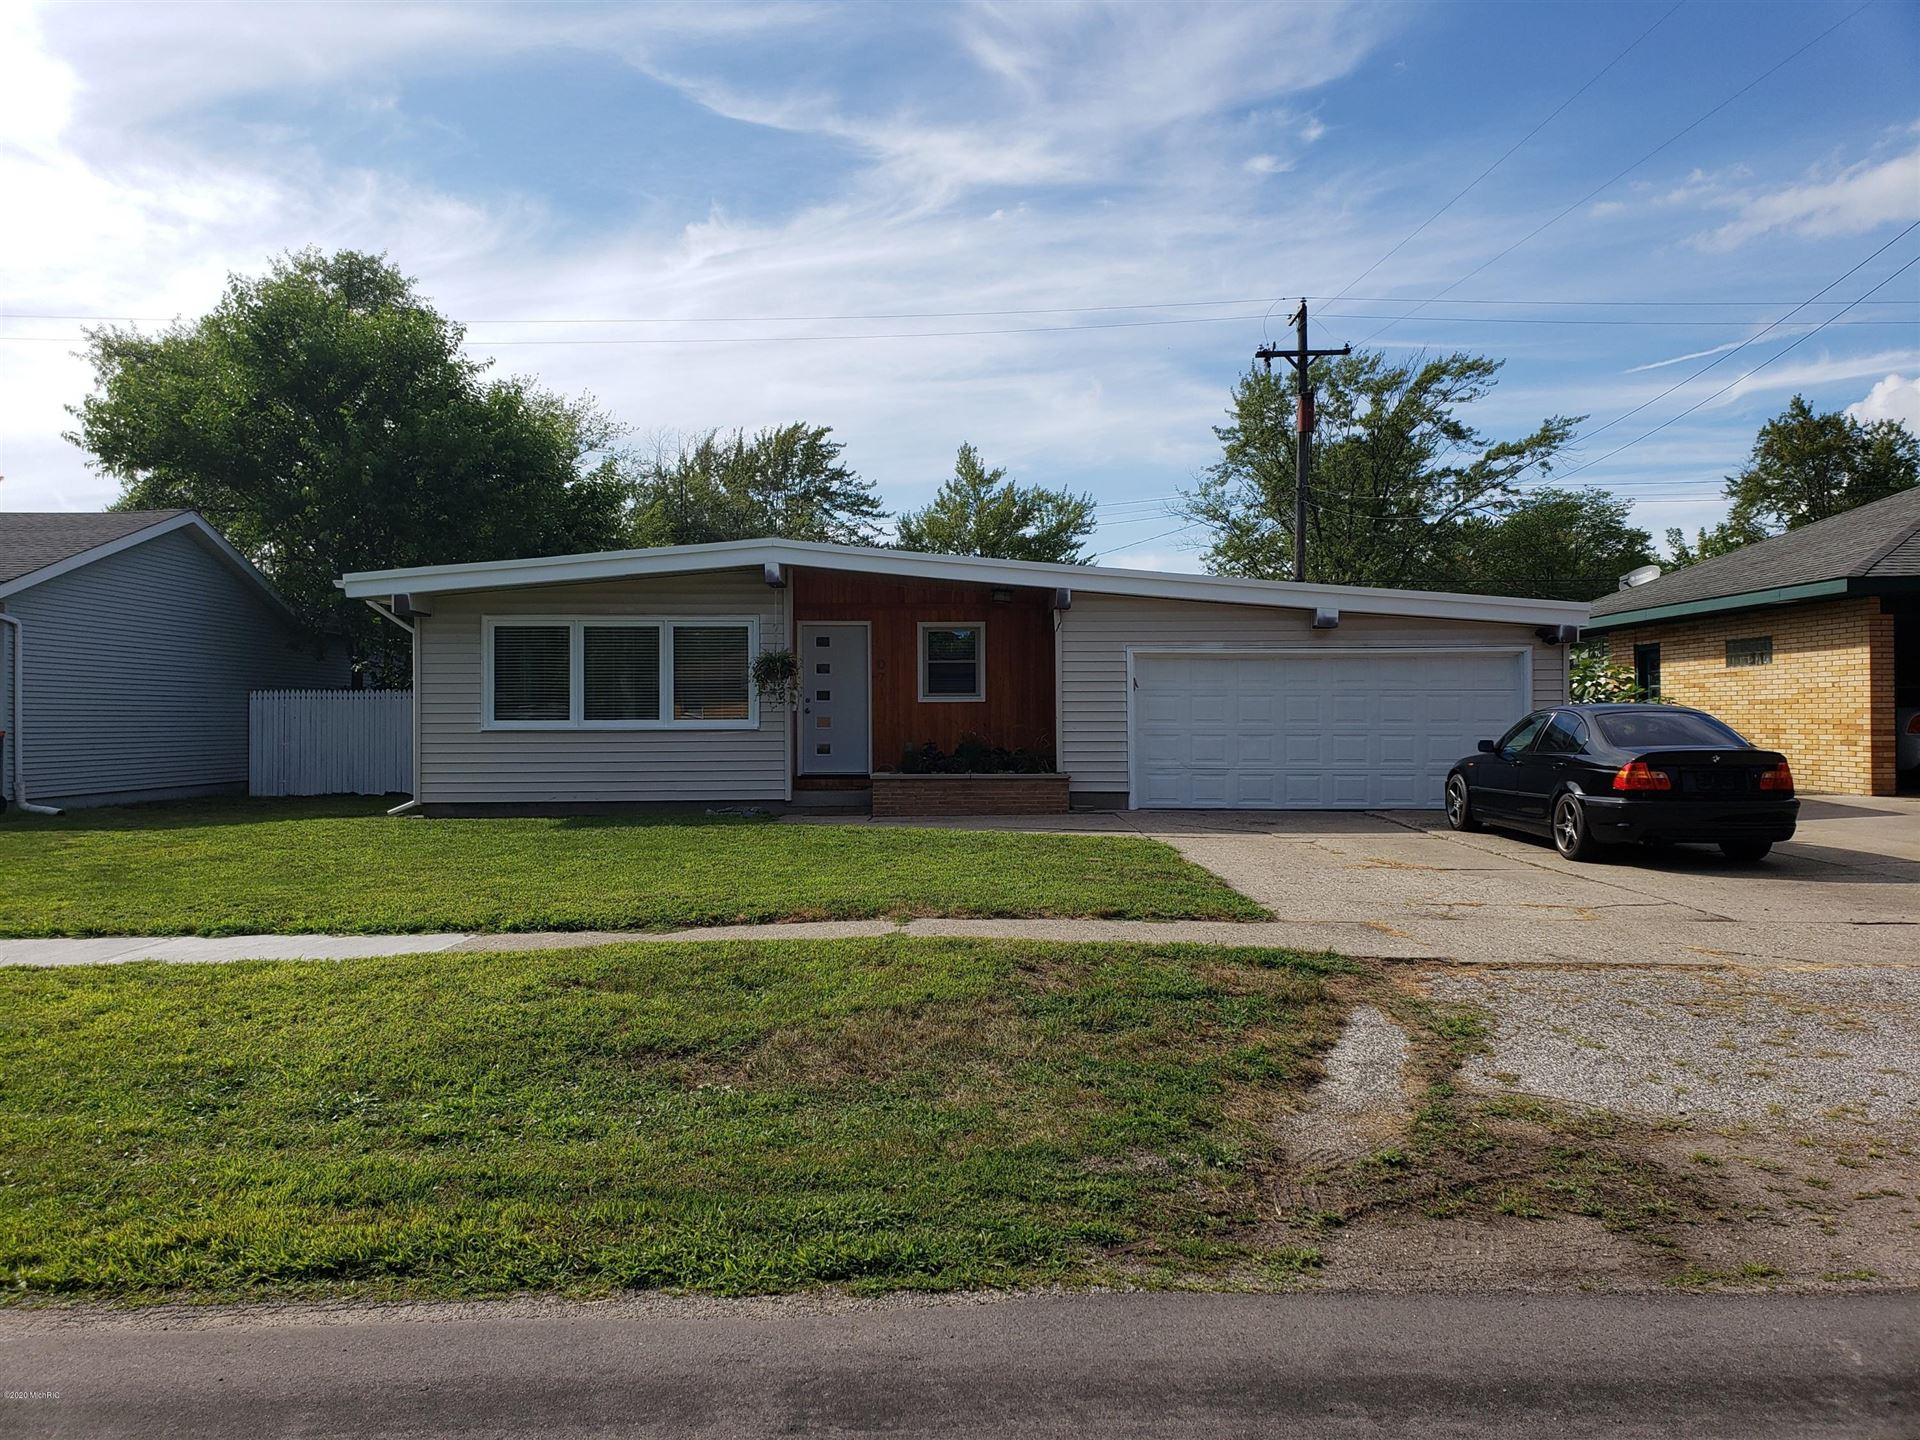 3071 Coolidge Road, Muskegon, MI 49441 - MLS#: 20030915